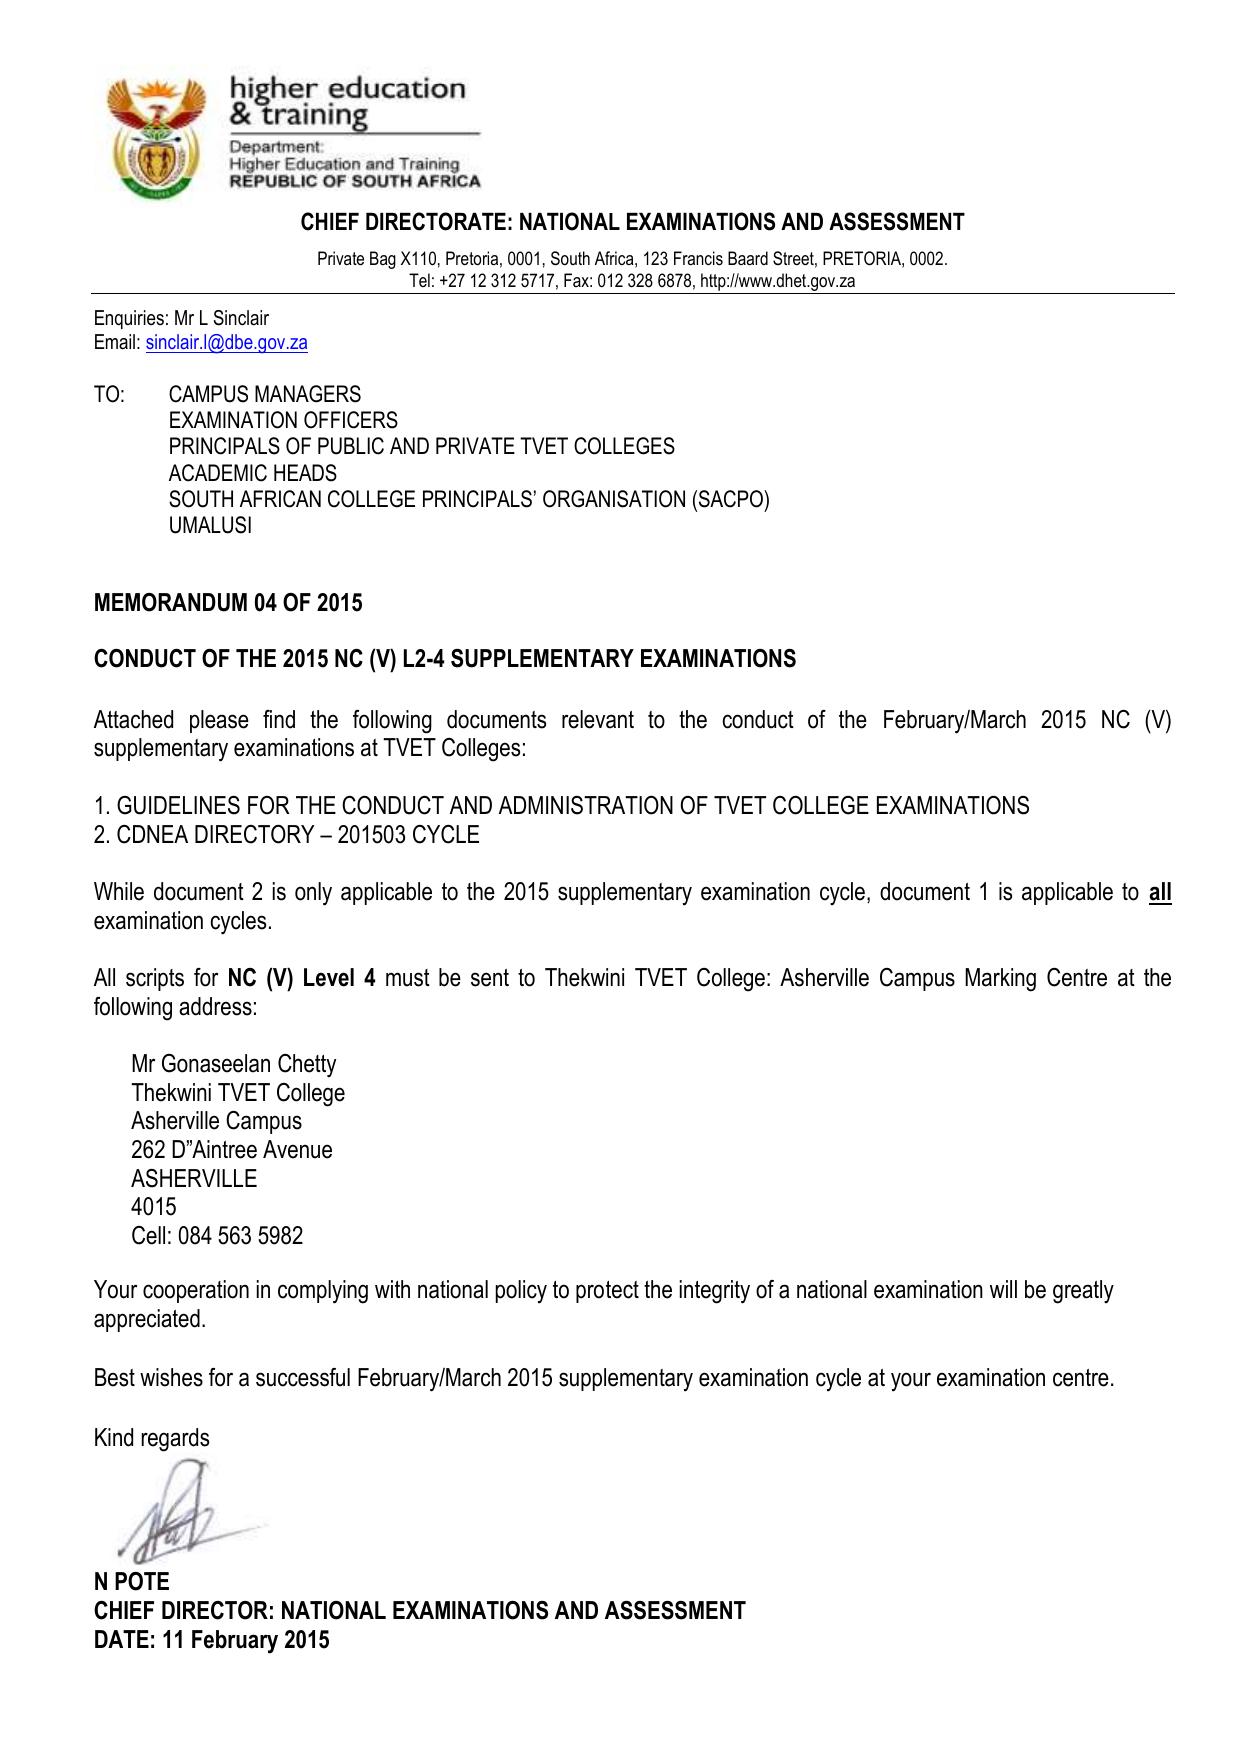 memorandum 04 of 2015 conduct of the 2015 nc v l2 rh studylib net